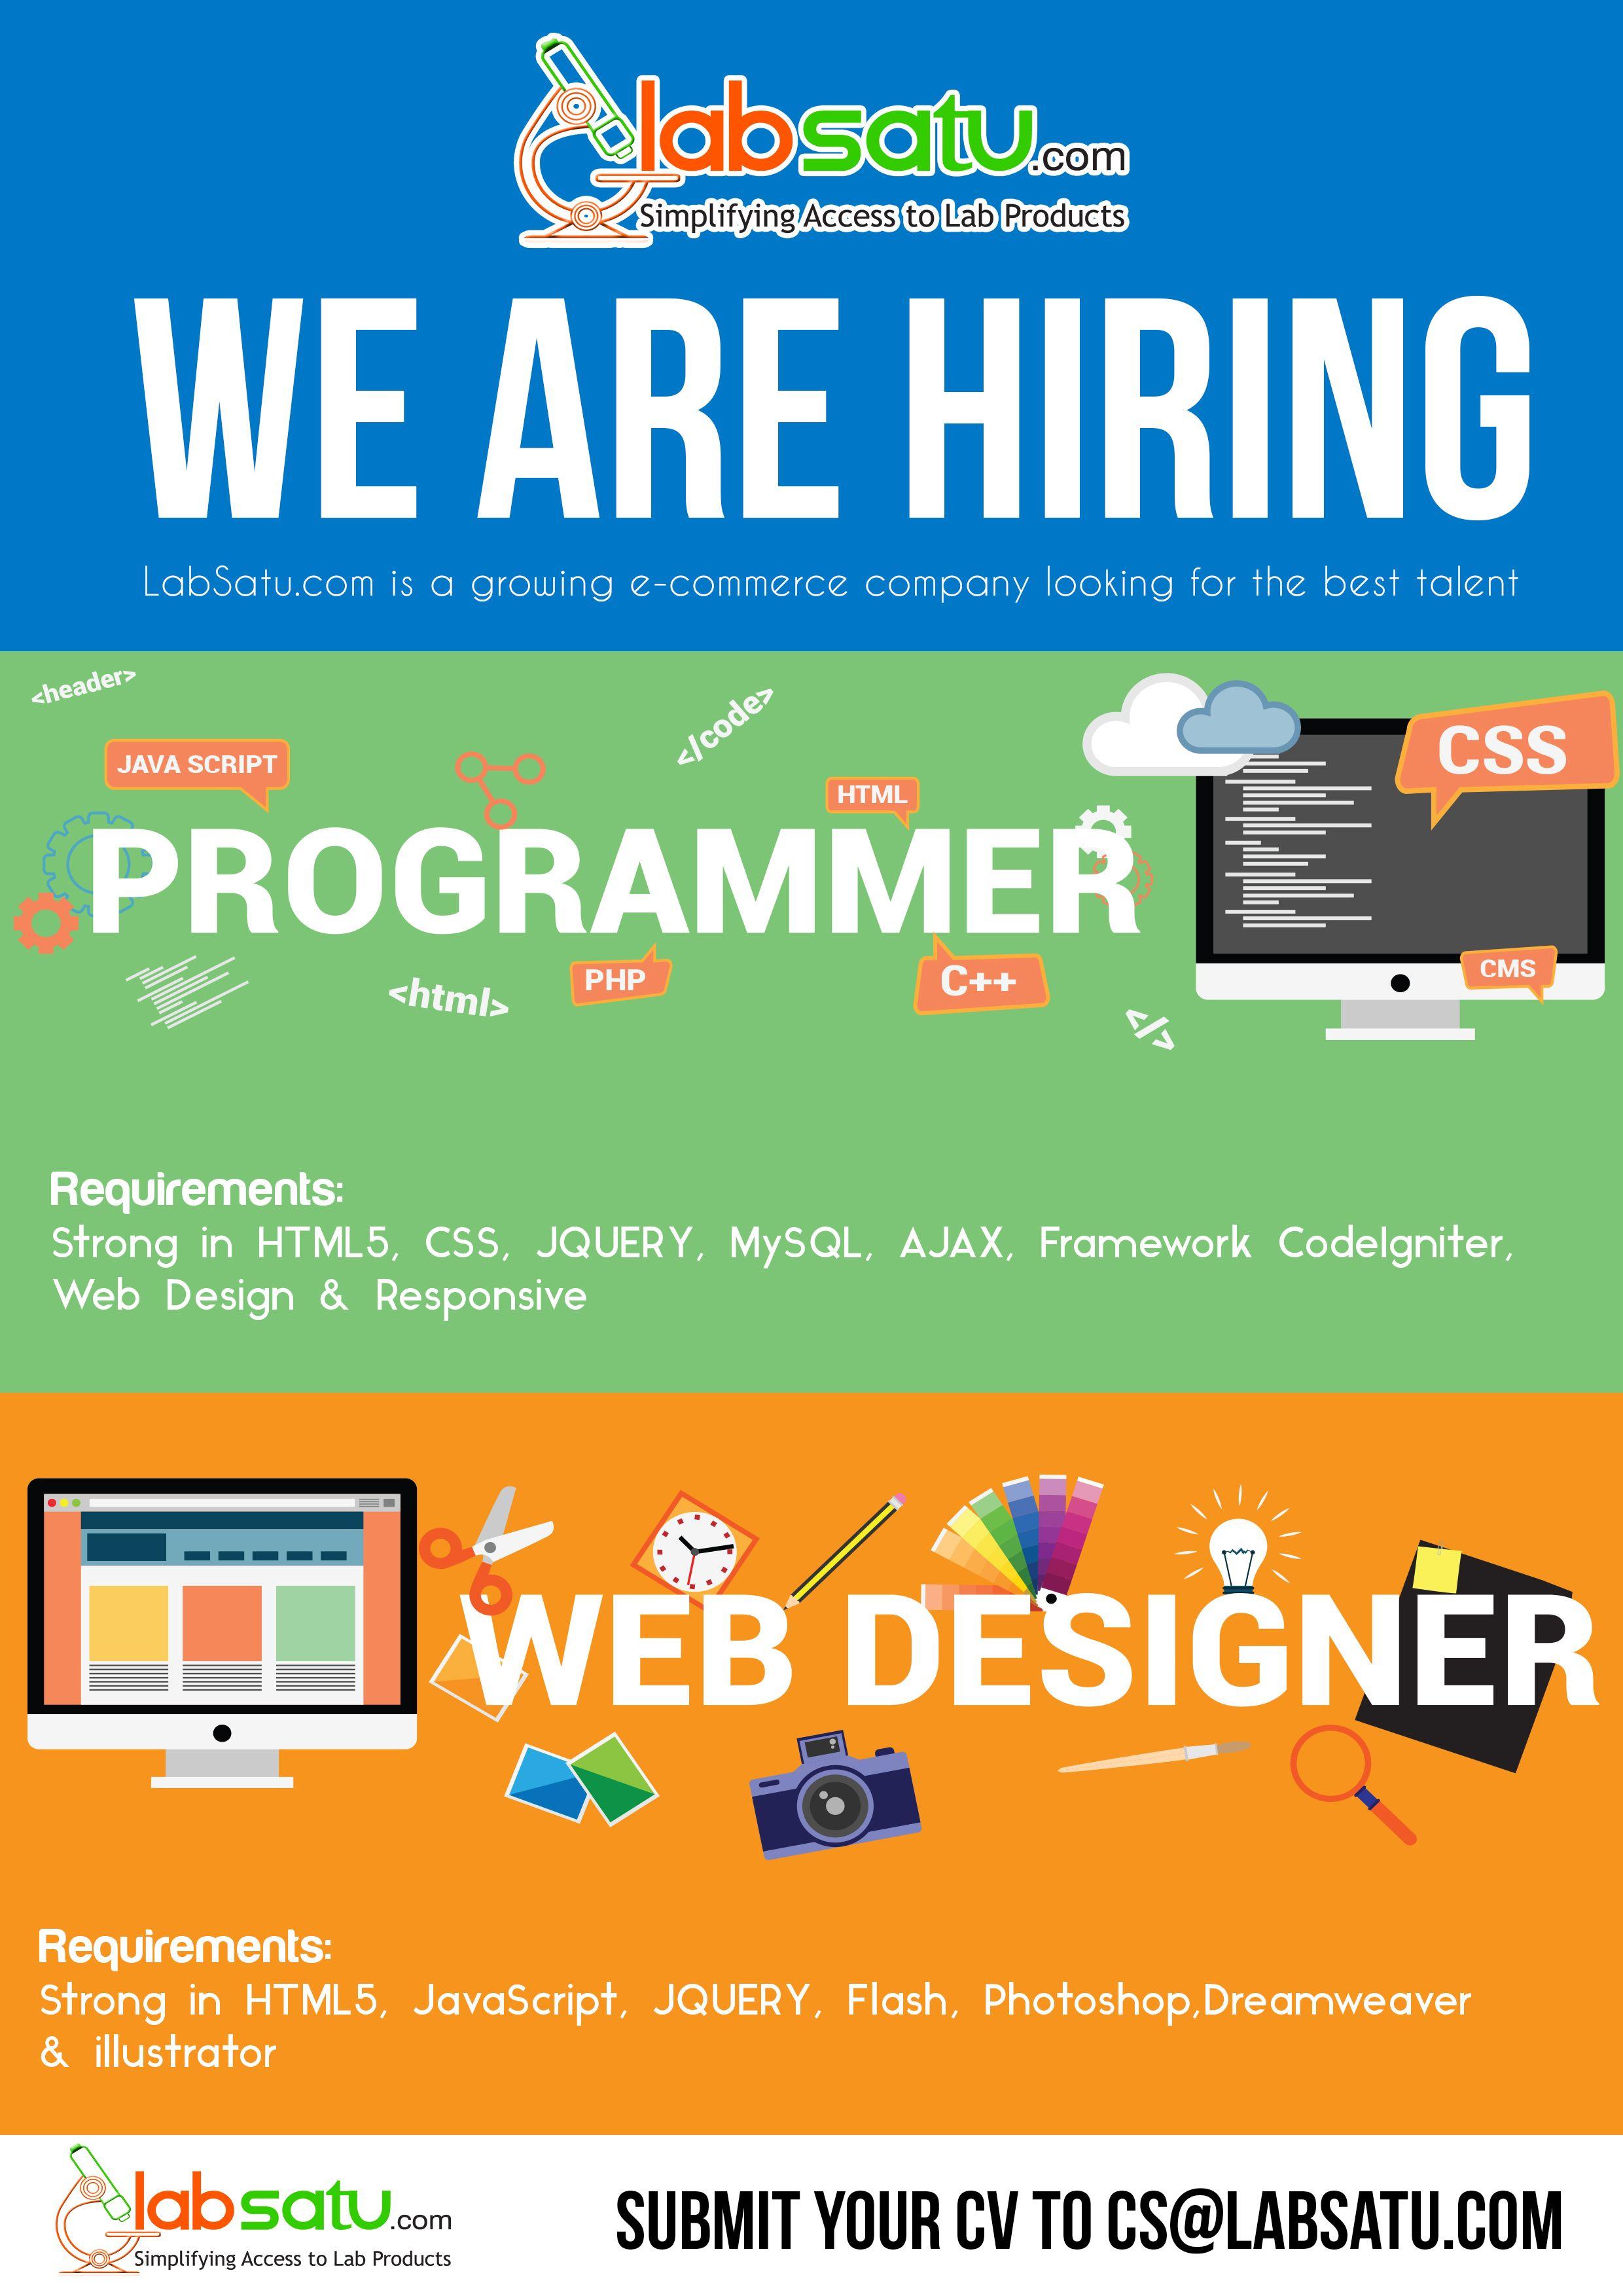 Info Lowongan Kerja Dicari Graphic Designer Internship Opportunity Programmer